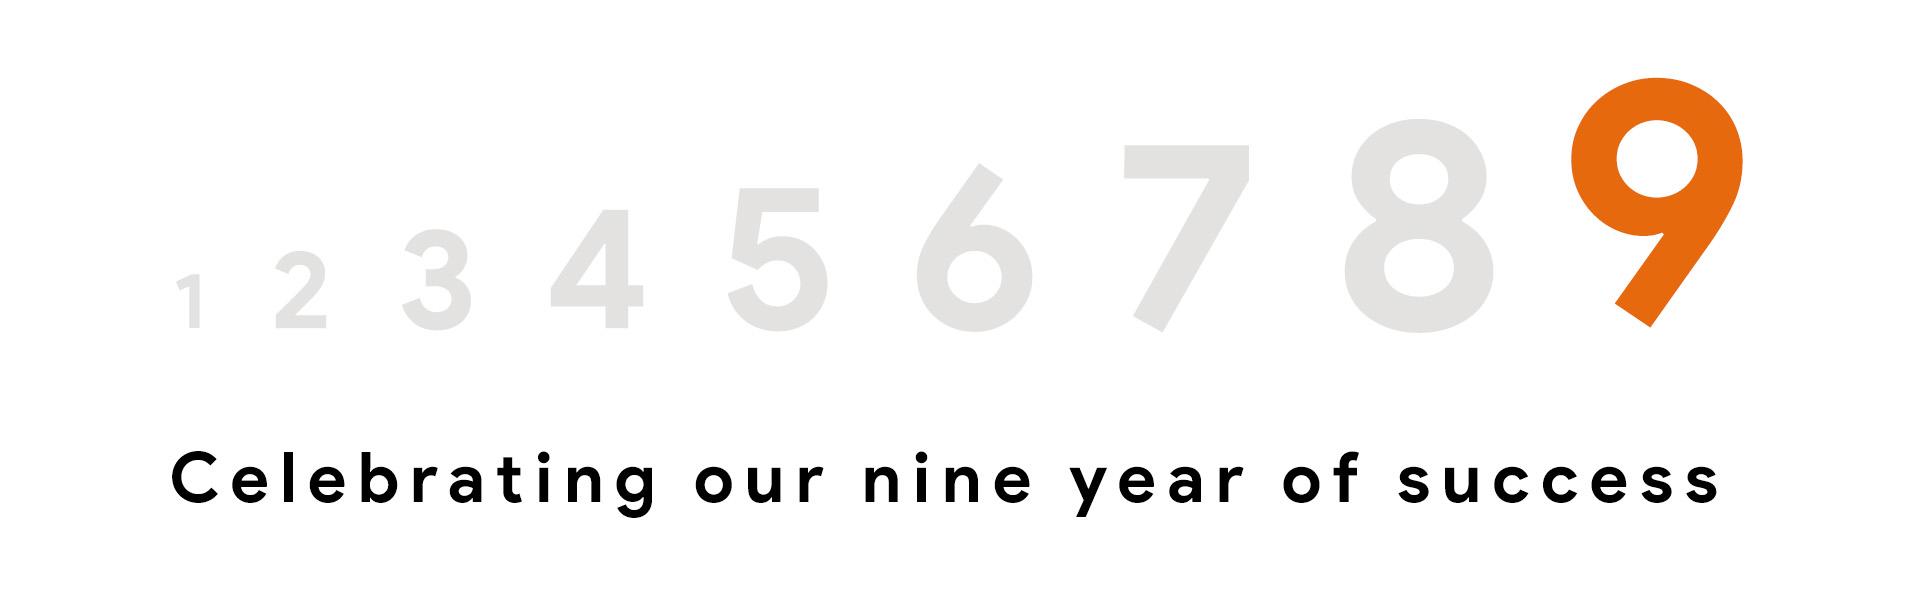 9th anniversary setubridge